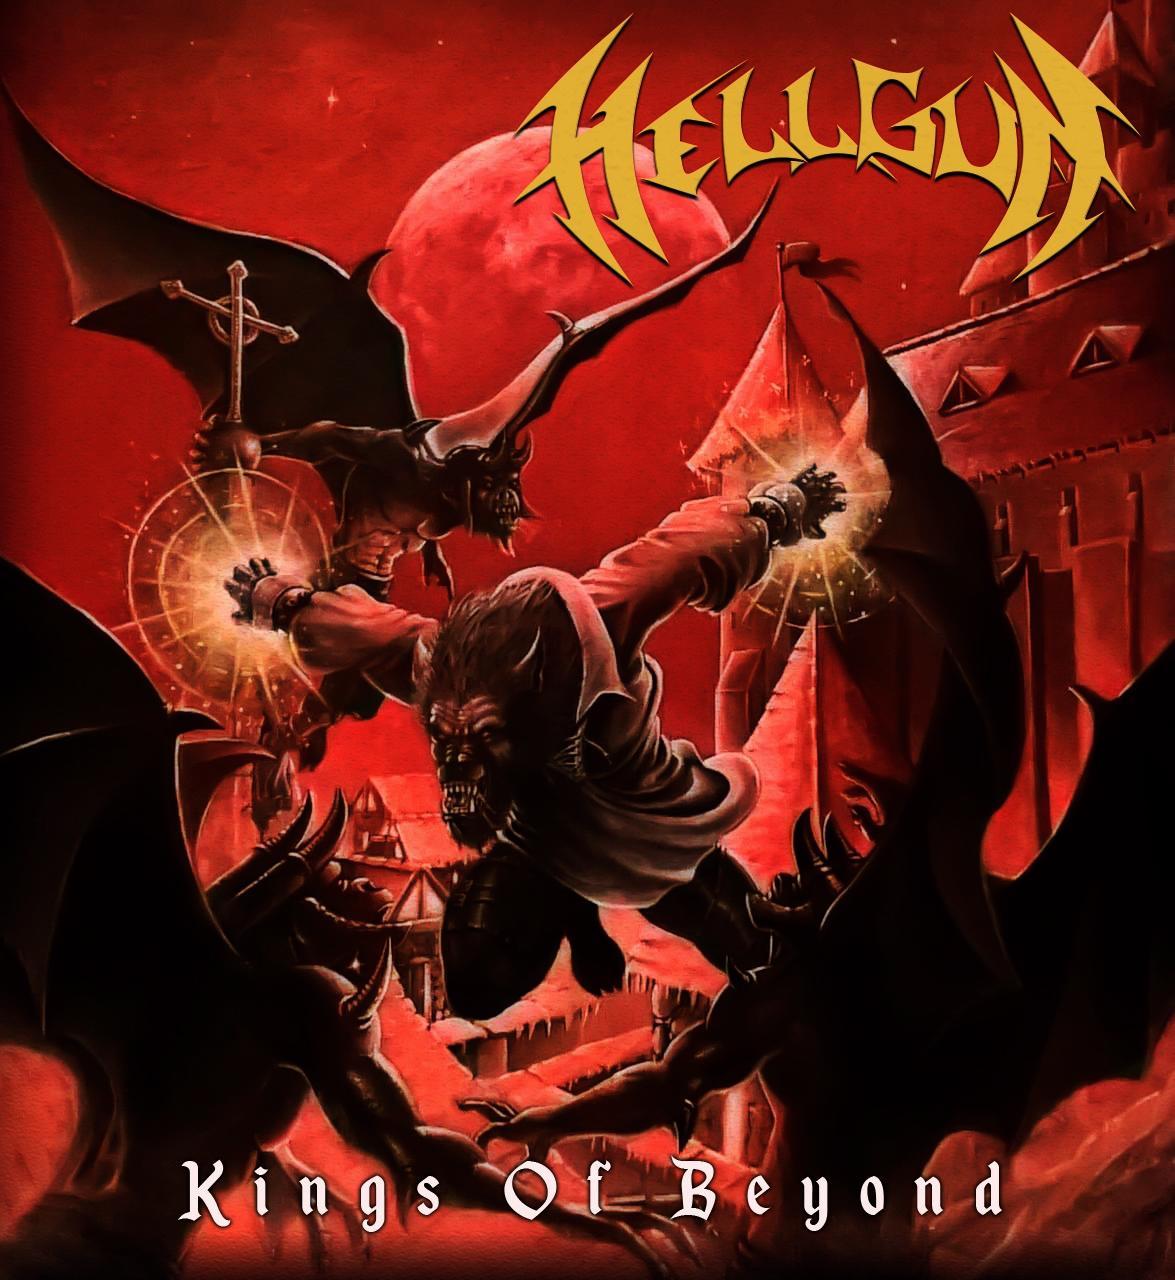 https://hmrock.com.br/wp-content/uploads/2020/08/Hell-Gun-Capa-Debut_Fotor.jpg